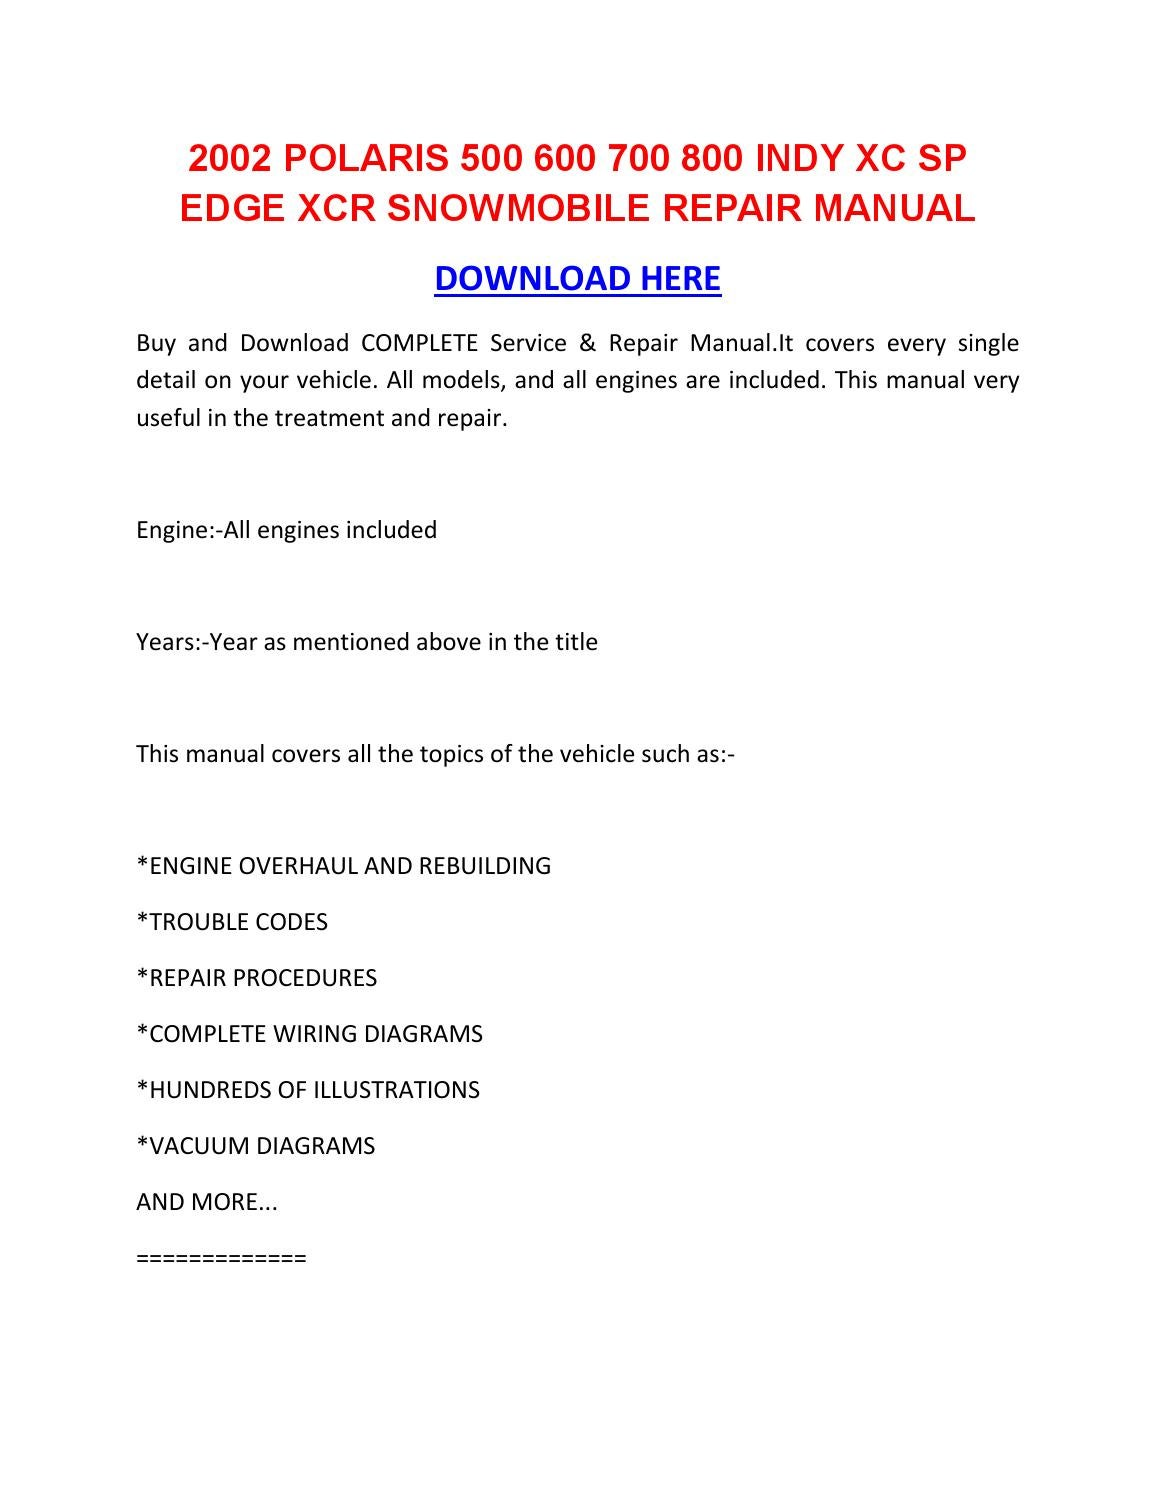 2002 Polaris 500 600 700 800 Indy Xc Sp Edge Xcr Snowmobile Repair Manual By Kayleurgansexz